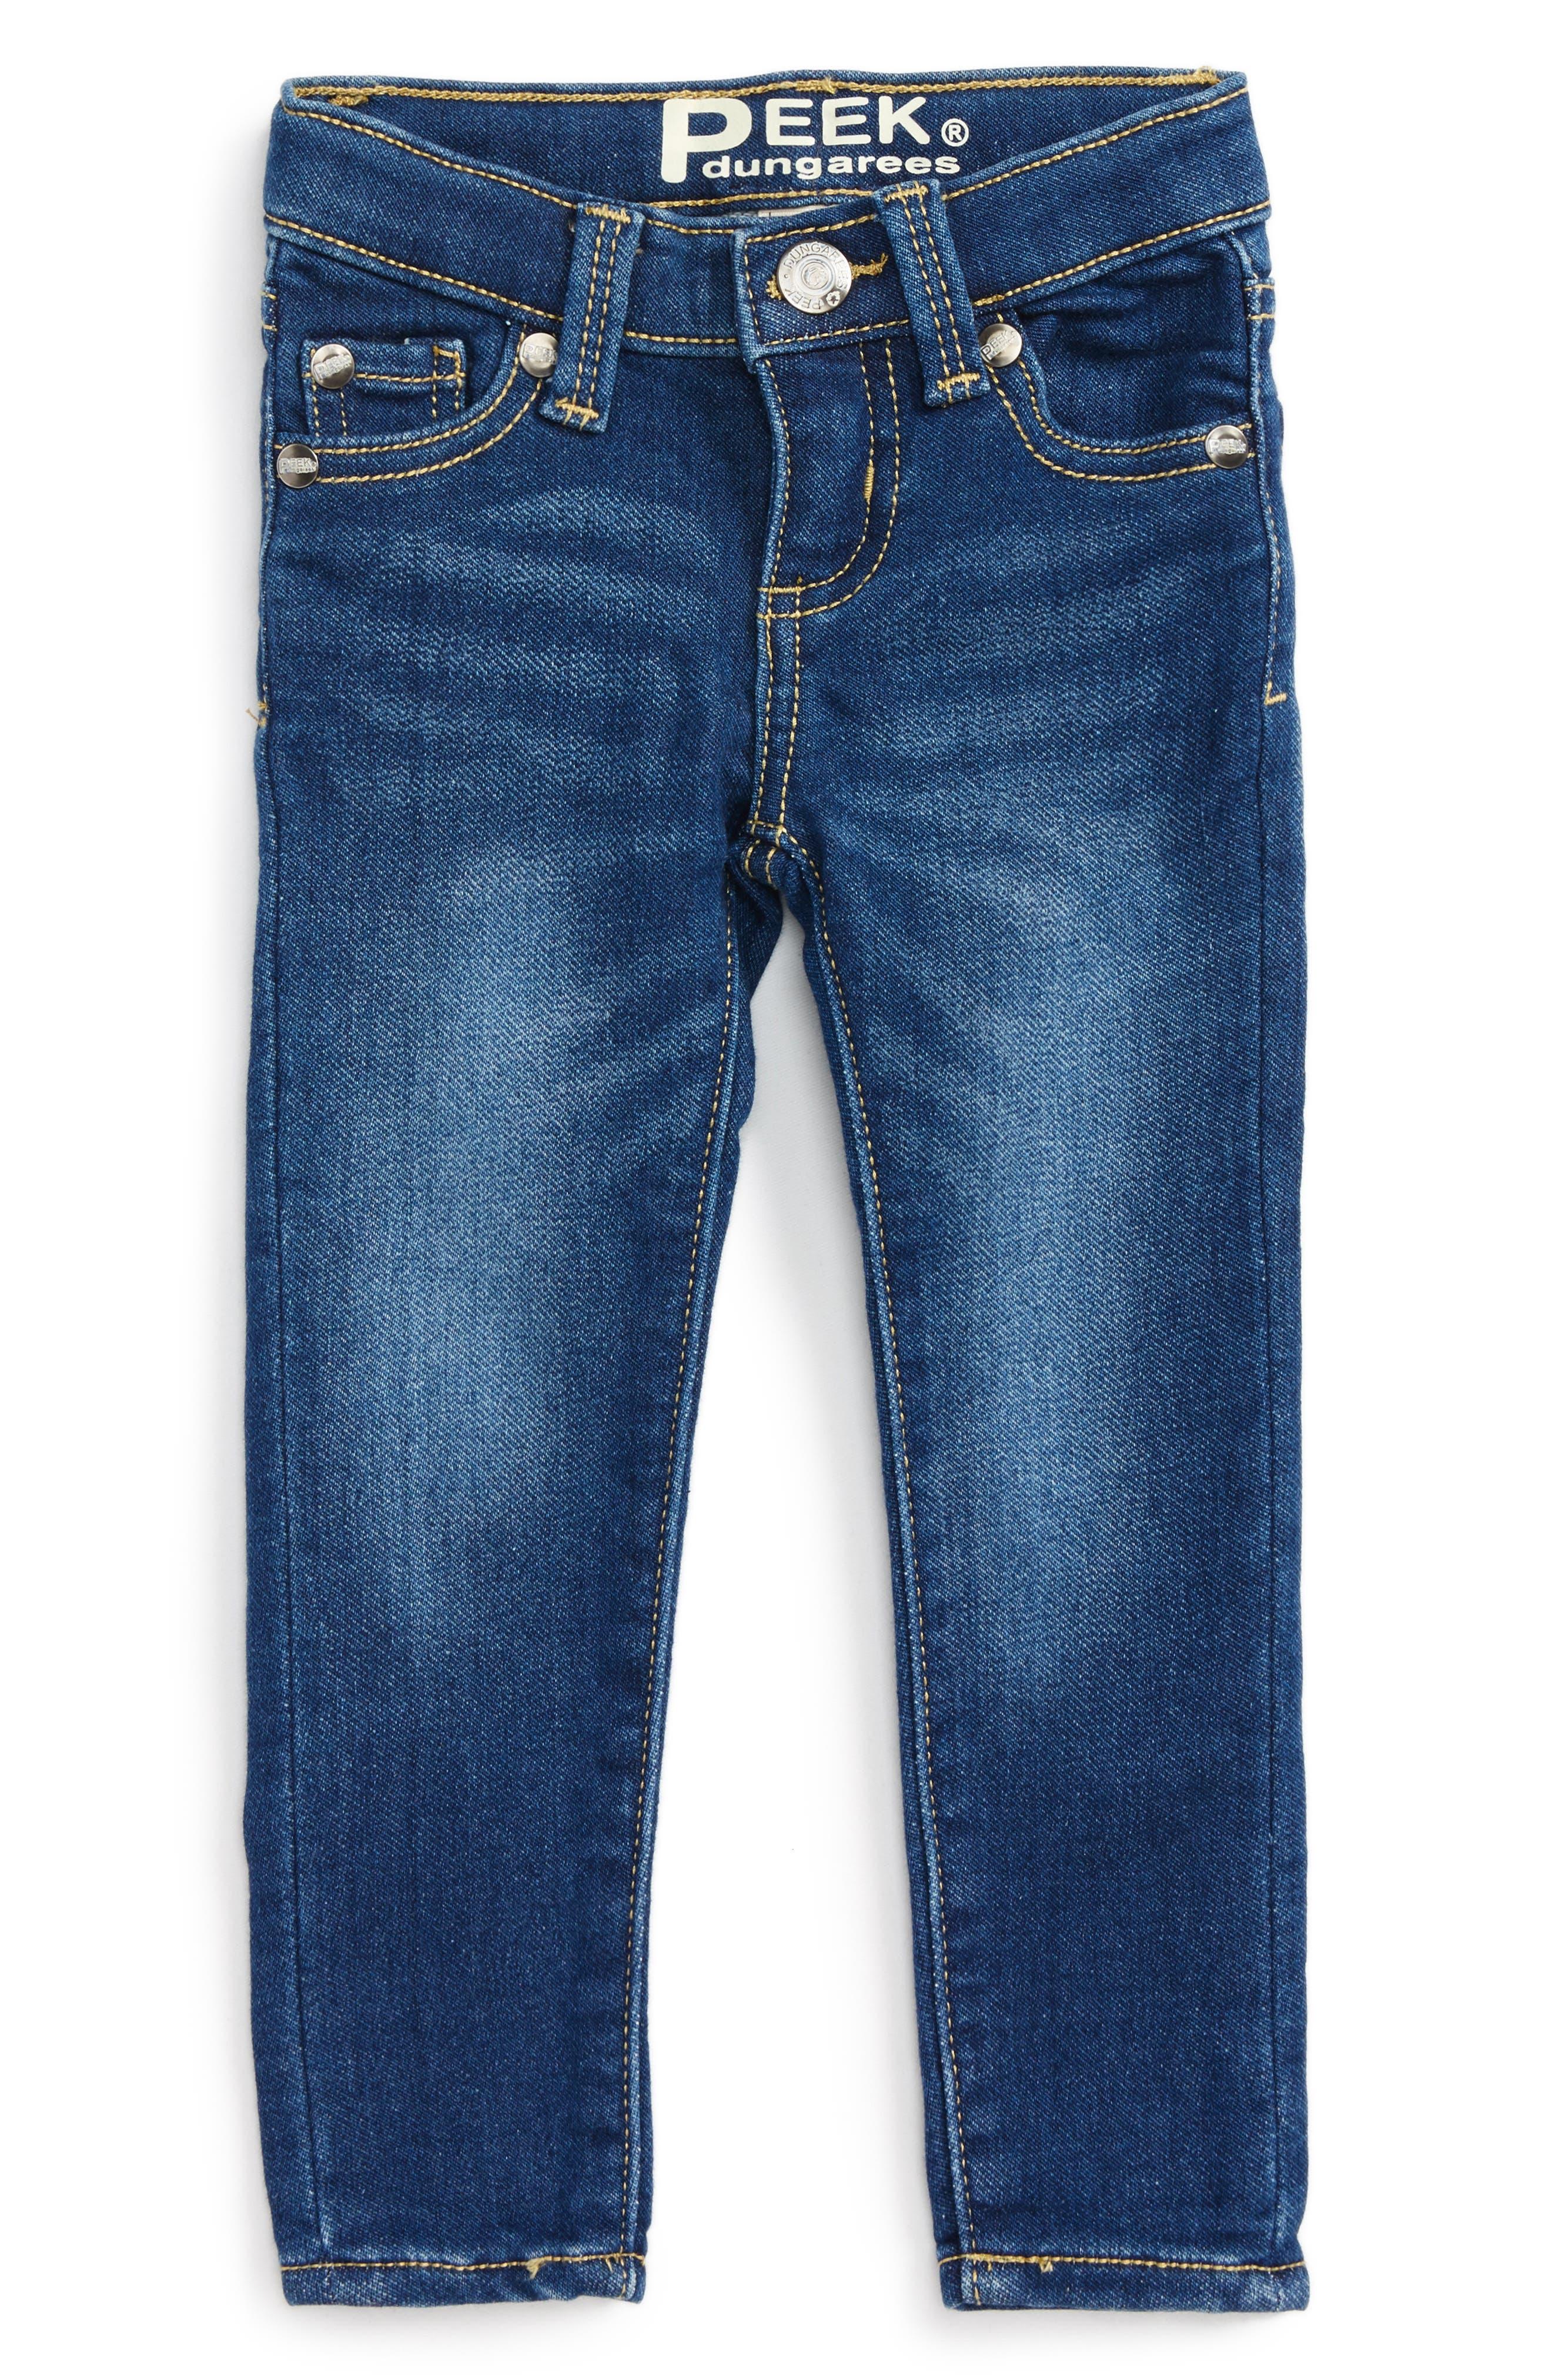 Taylor Skinny Jeans,                             Main thumbnail 1, color,                             416